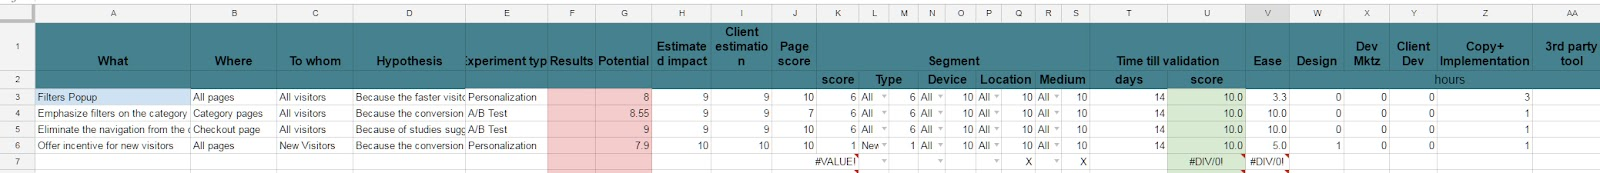 Audit Spreadsheet